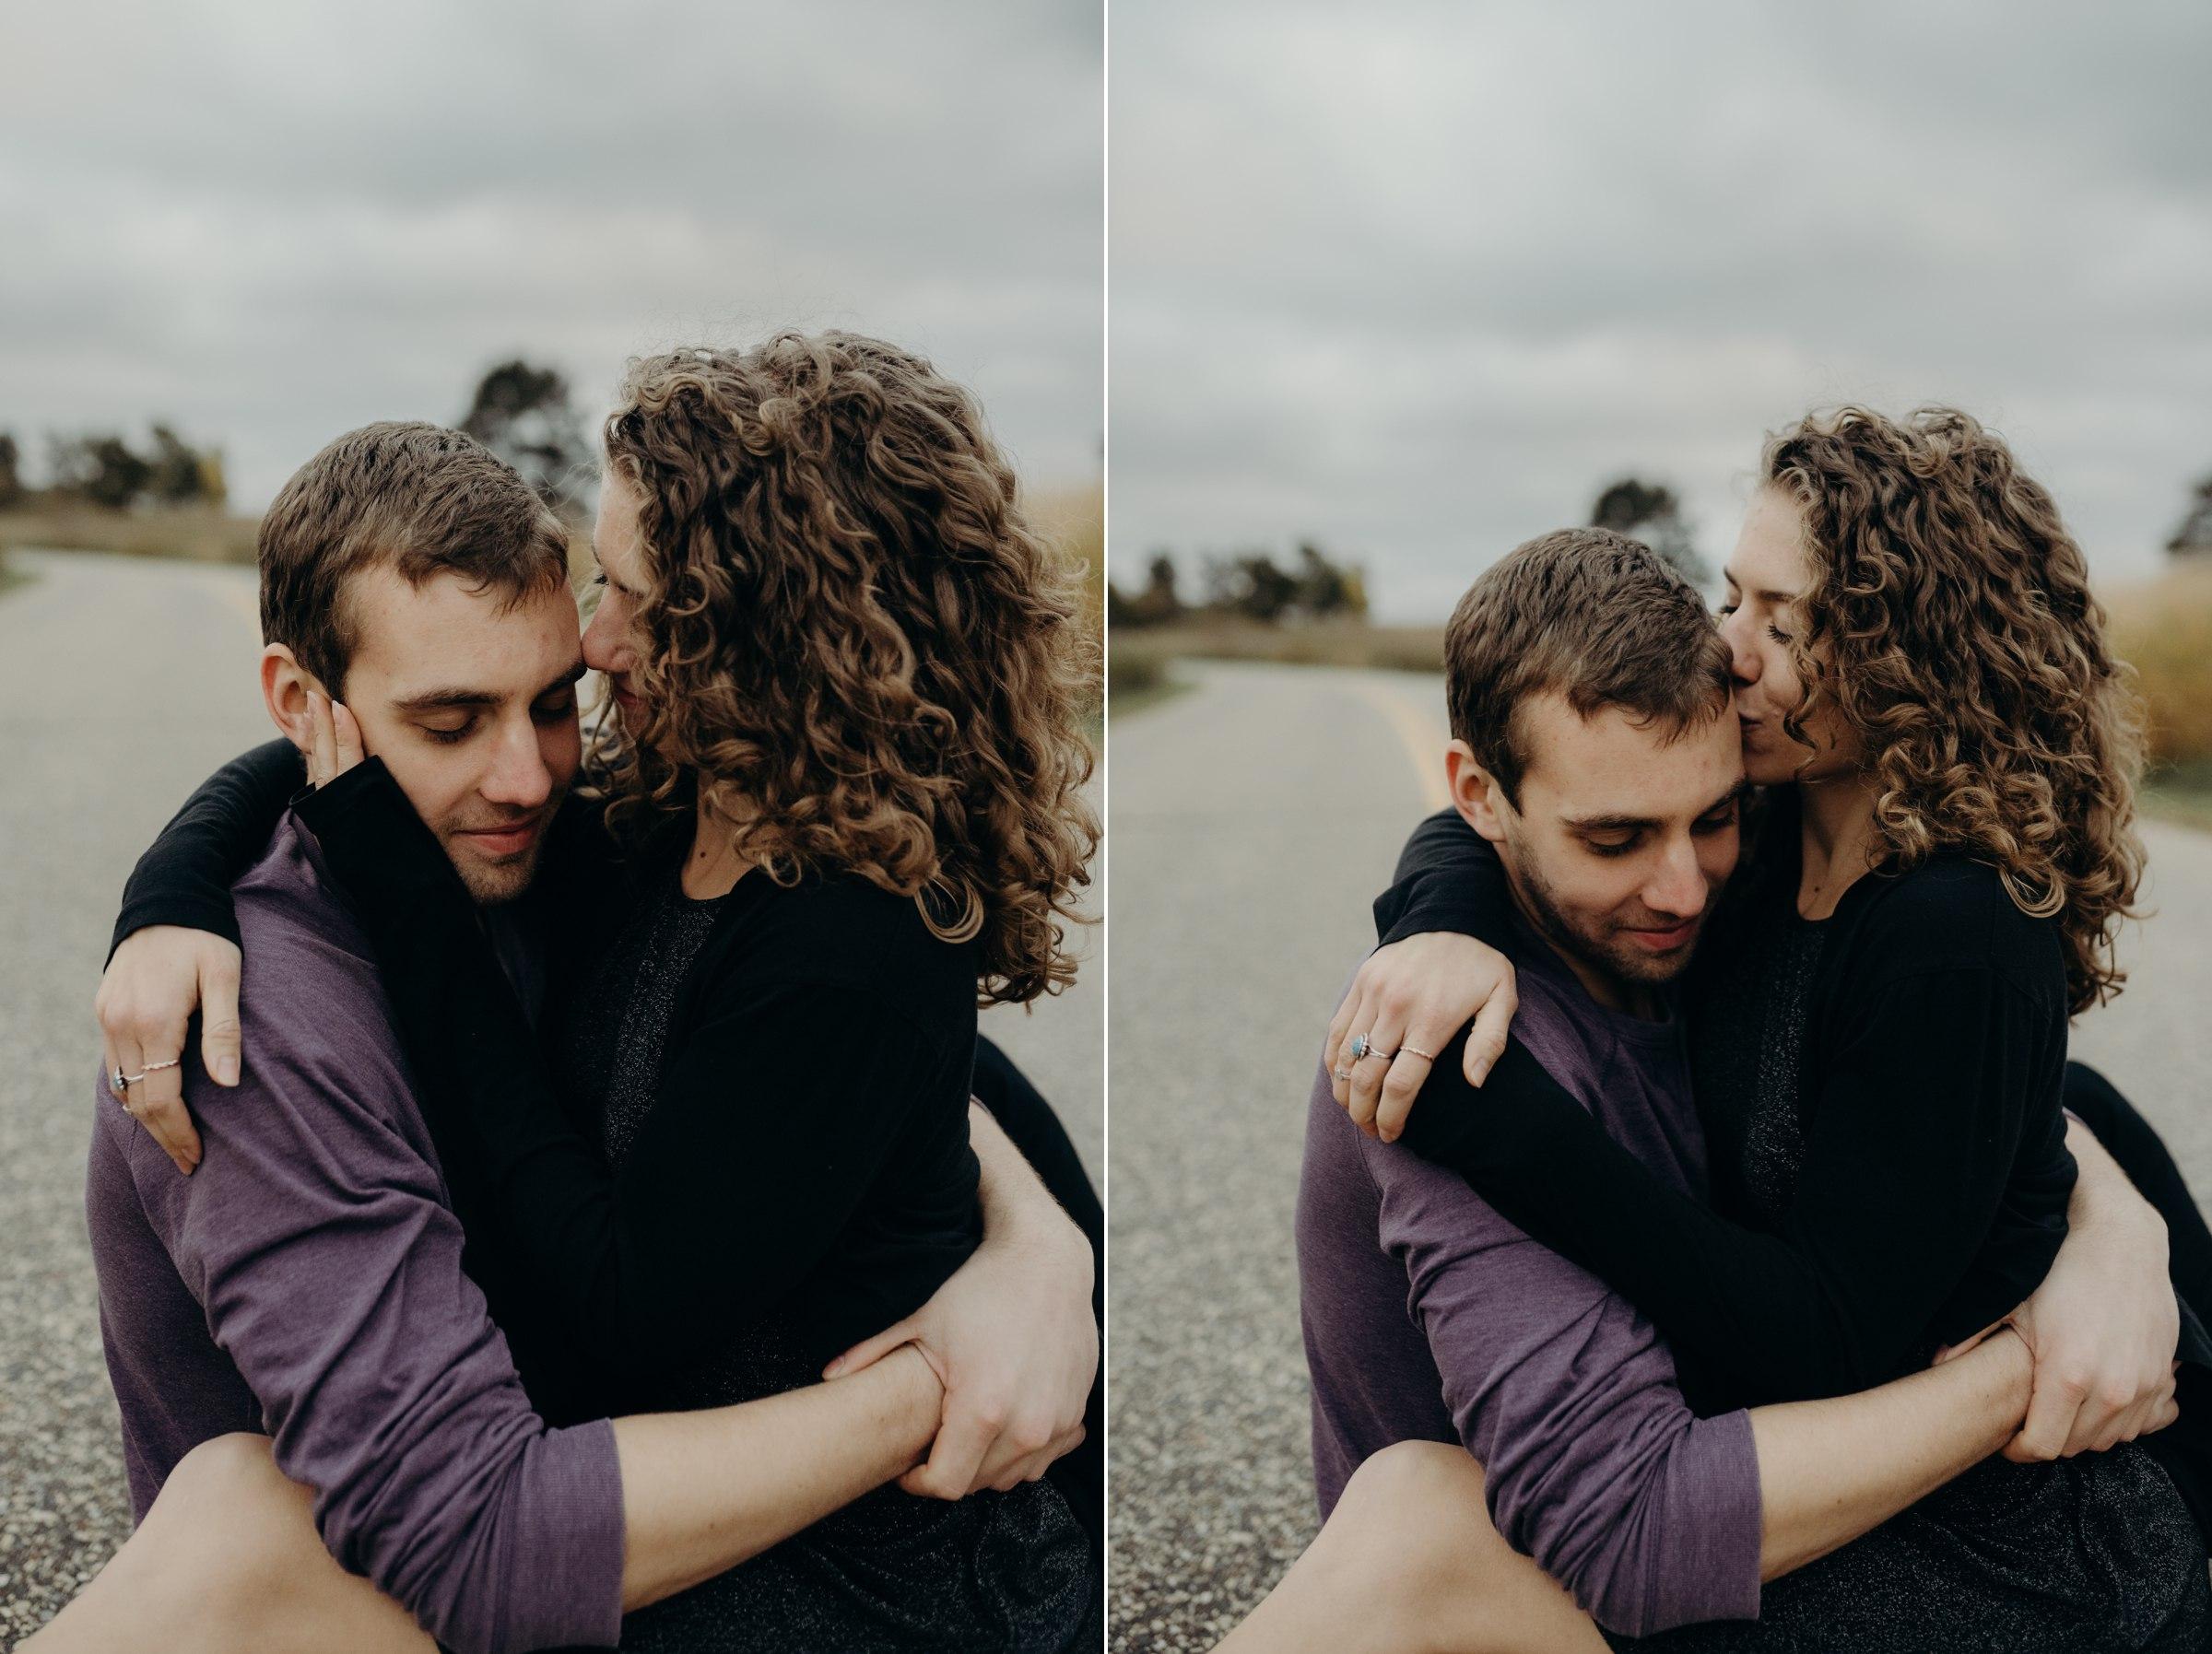 nickmezaphotography-austin-minneapolis-wedding-photographer-elopement-best-intimate-adventurous-destination-texas-minnesota-engagement-jess-dan-spacesaver_0188.jpg